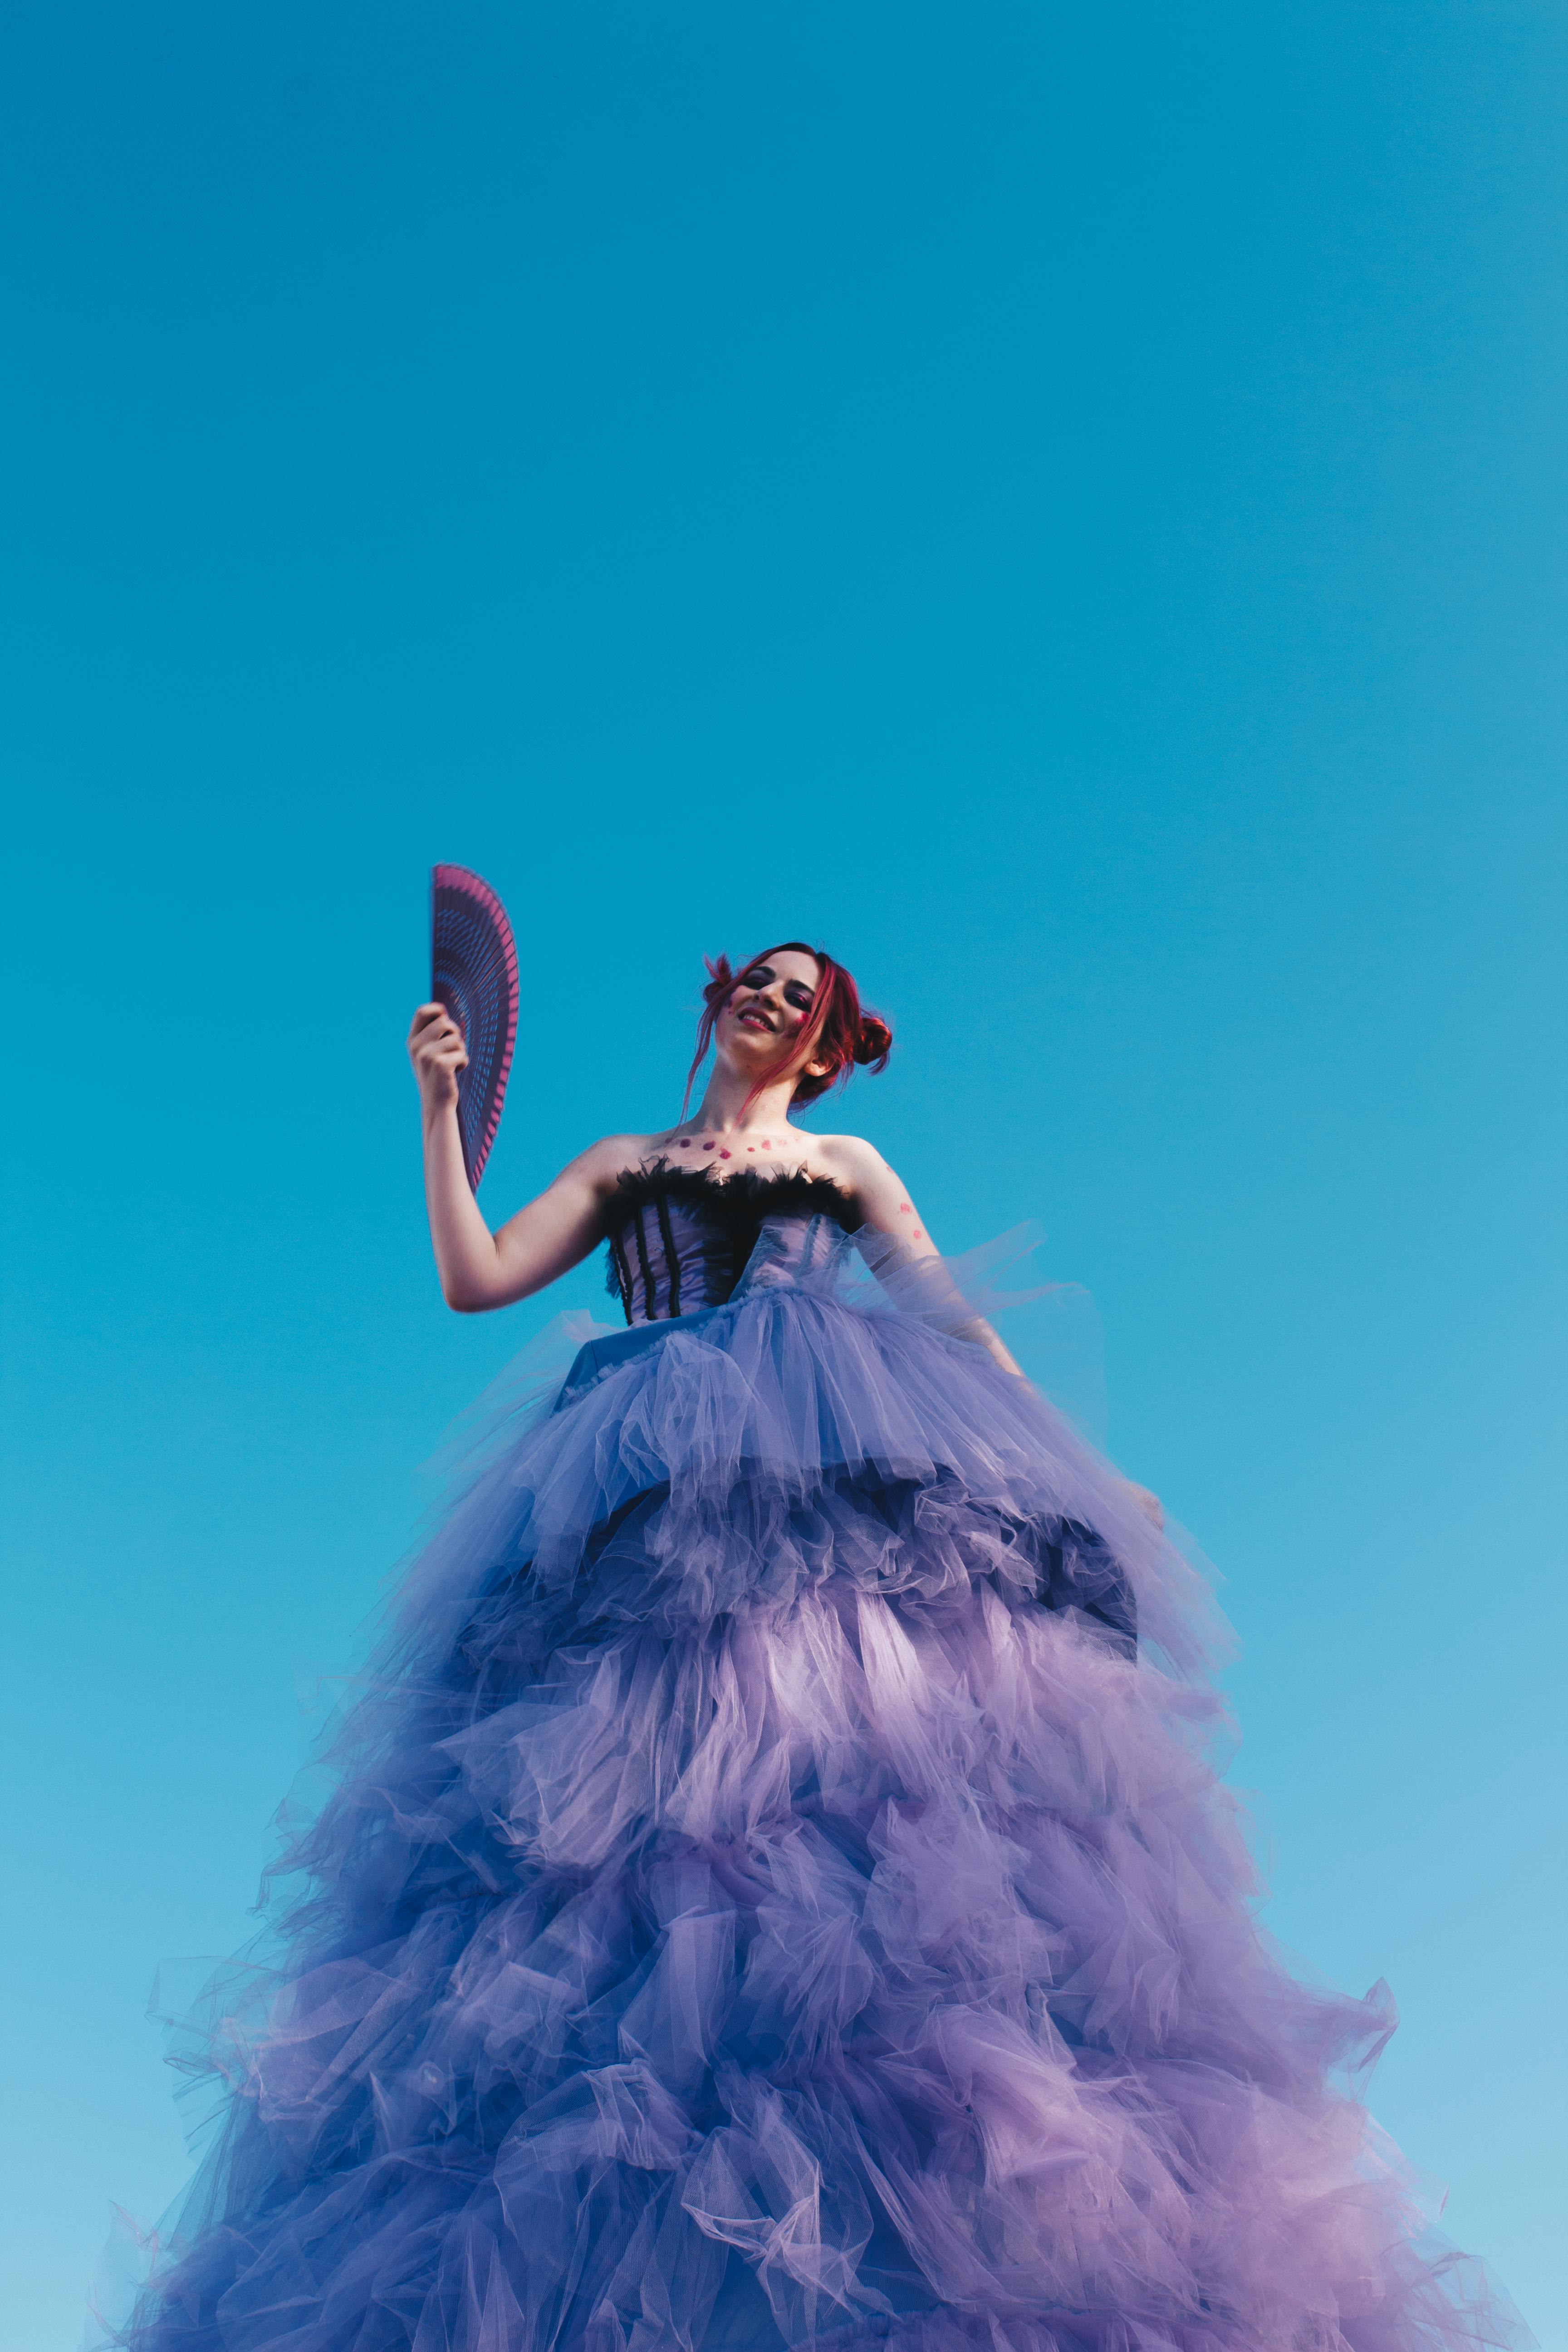 Woman in black and purple ruffle dress holding hand fan photo